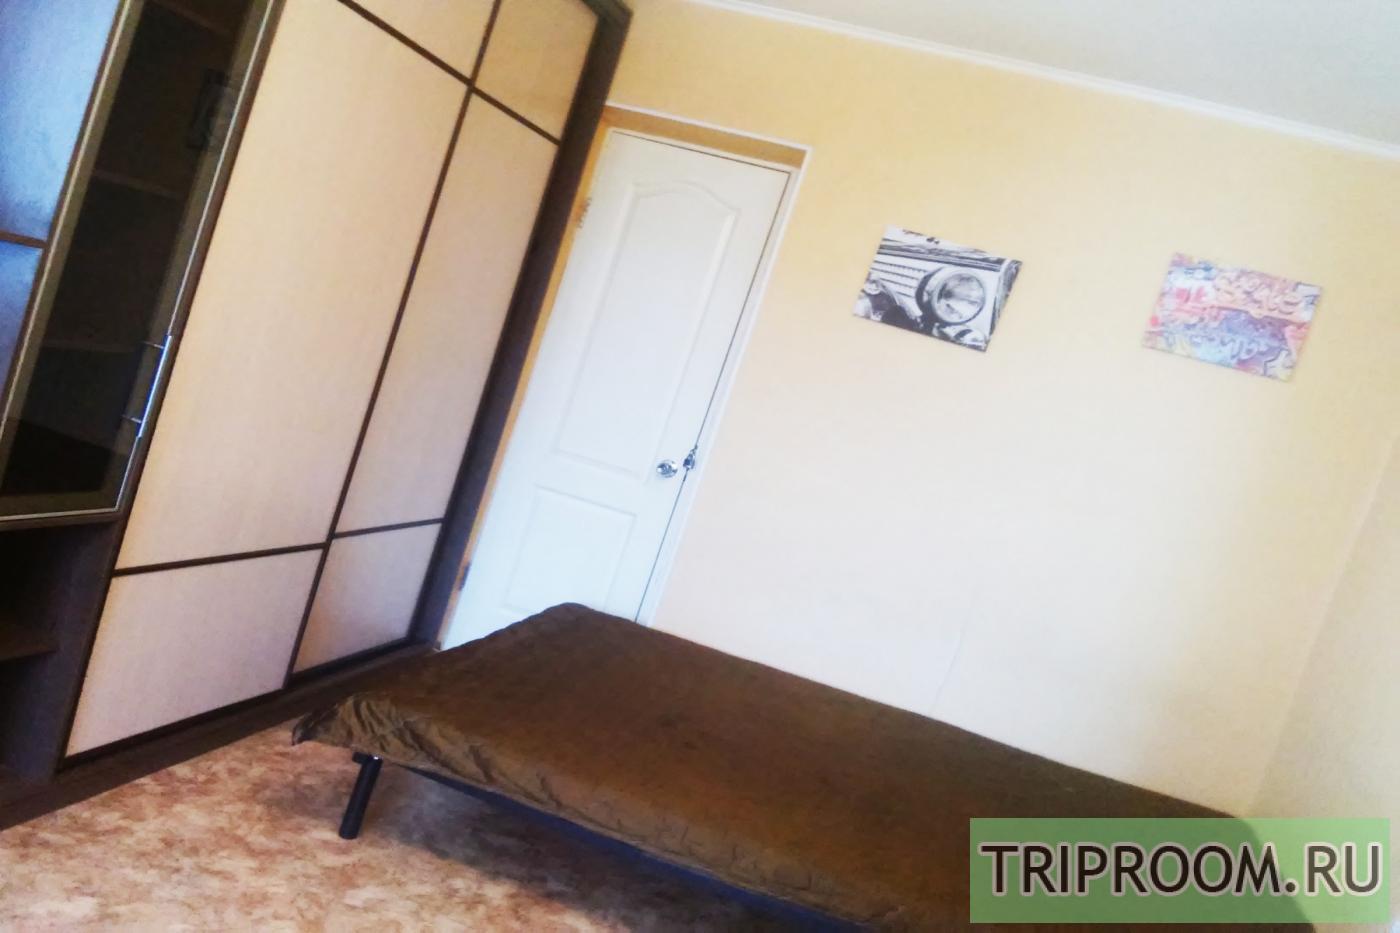 1-комнатная квартира посуточно (вариант № 34542), ул. Маршала Рыбалко, фото № 12